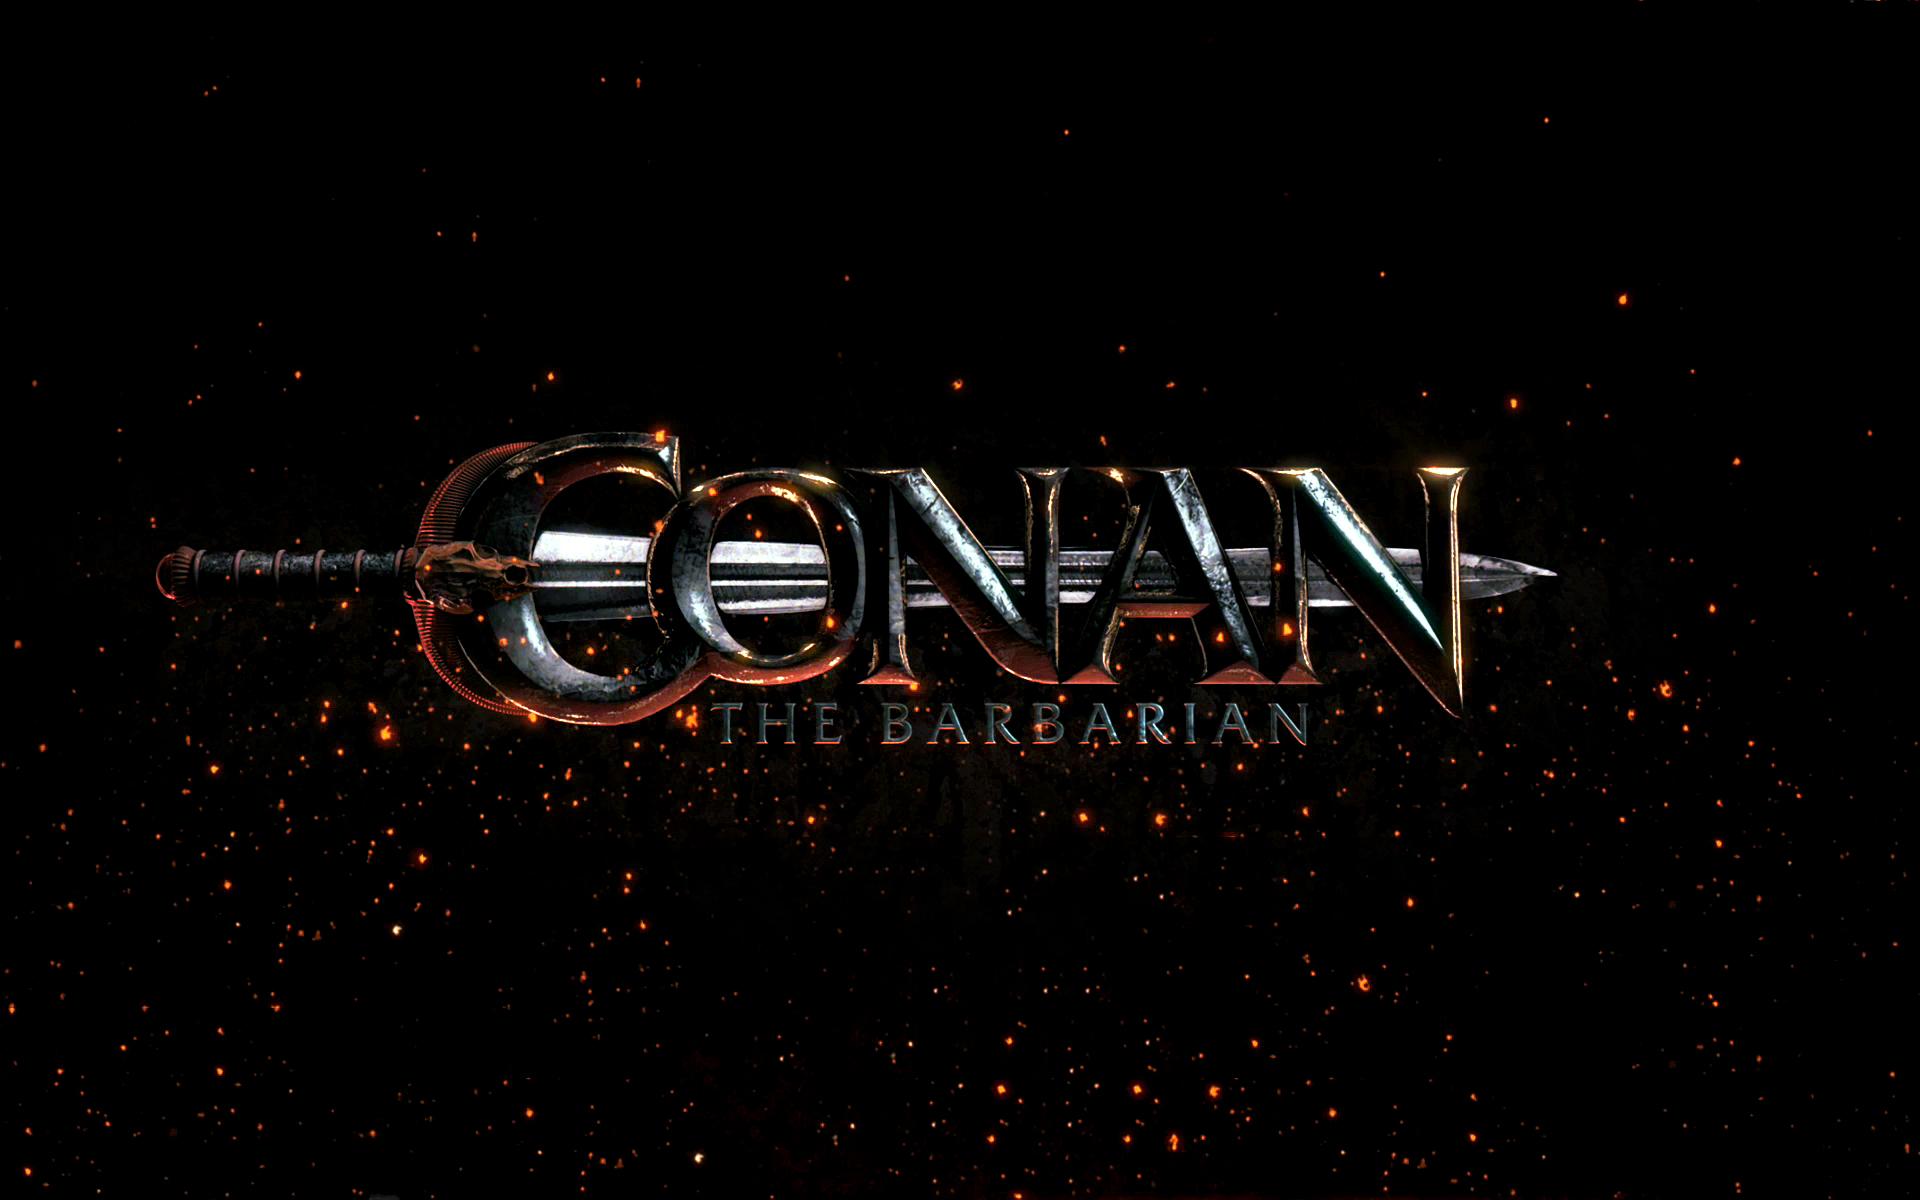 Conan-The-Barbarian-Wallpapers-1920x1200